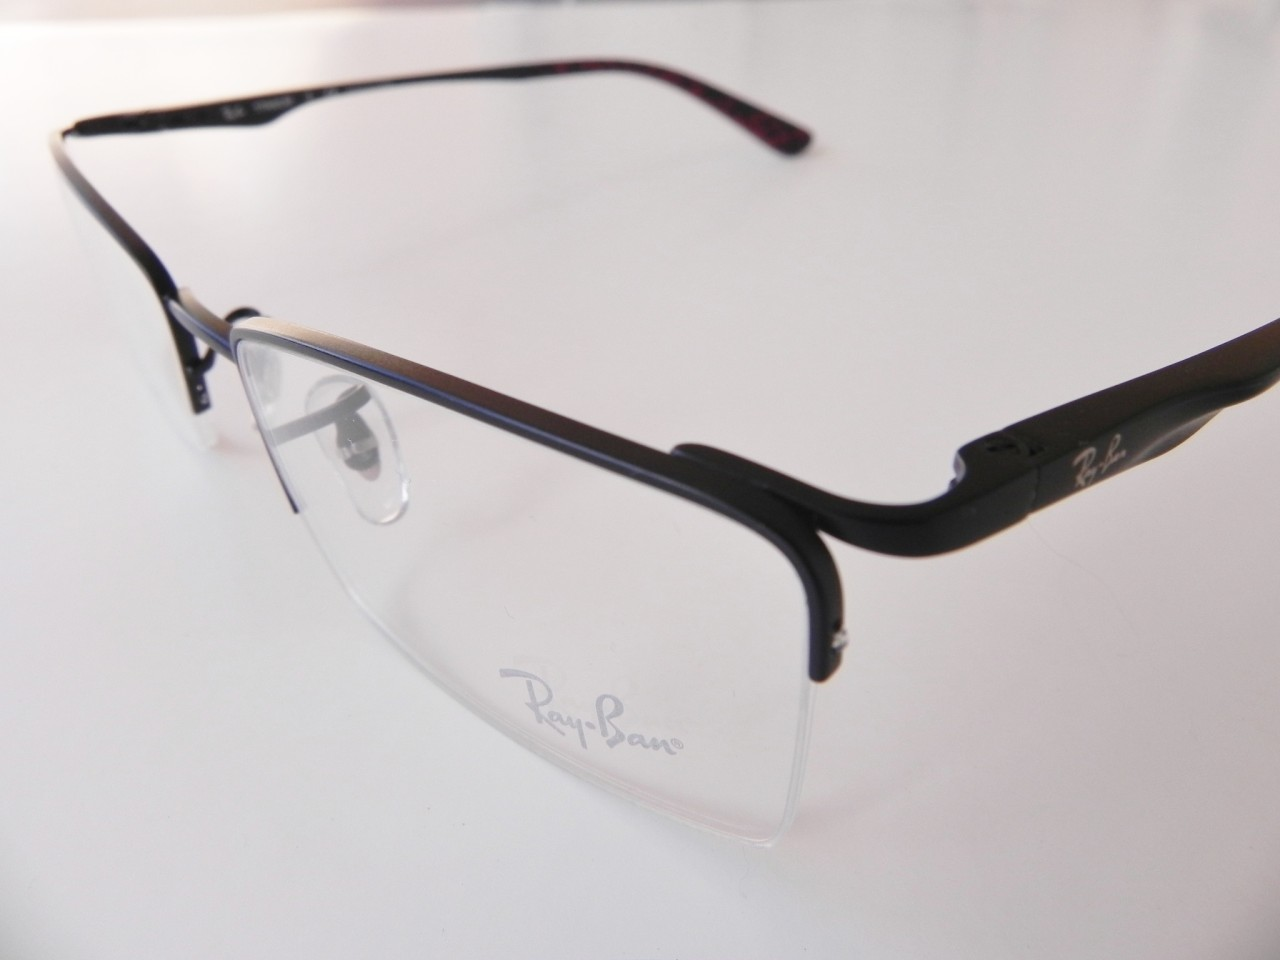 Rimless Glasses Ray Ban : Ray Ban Rimless Eyeglasses